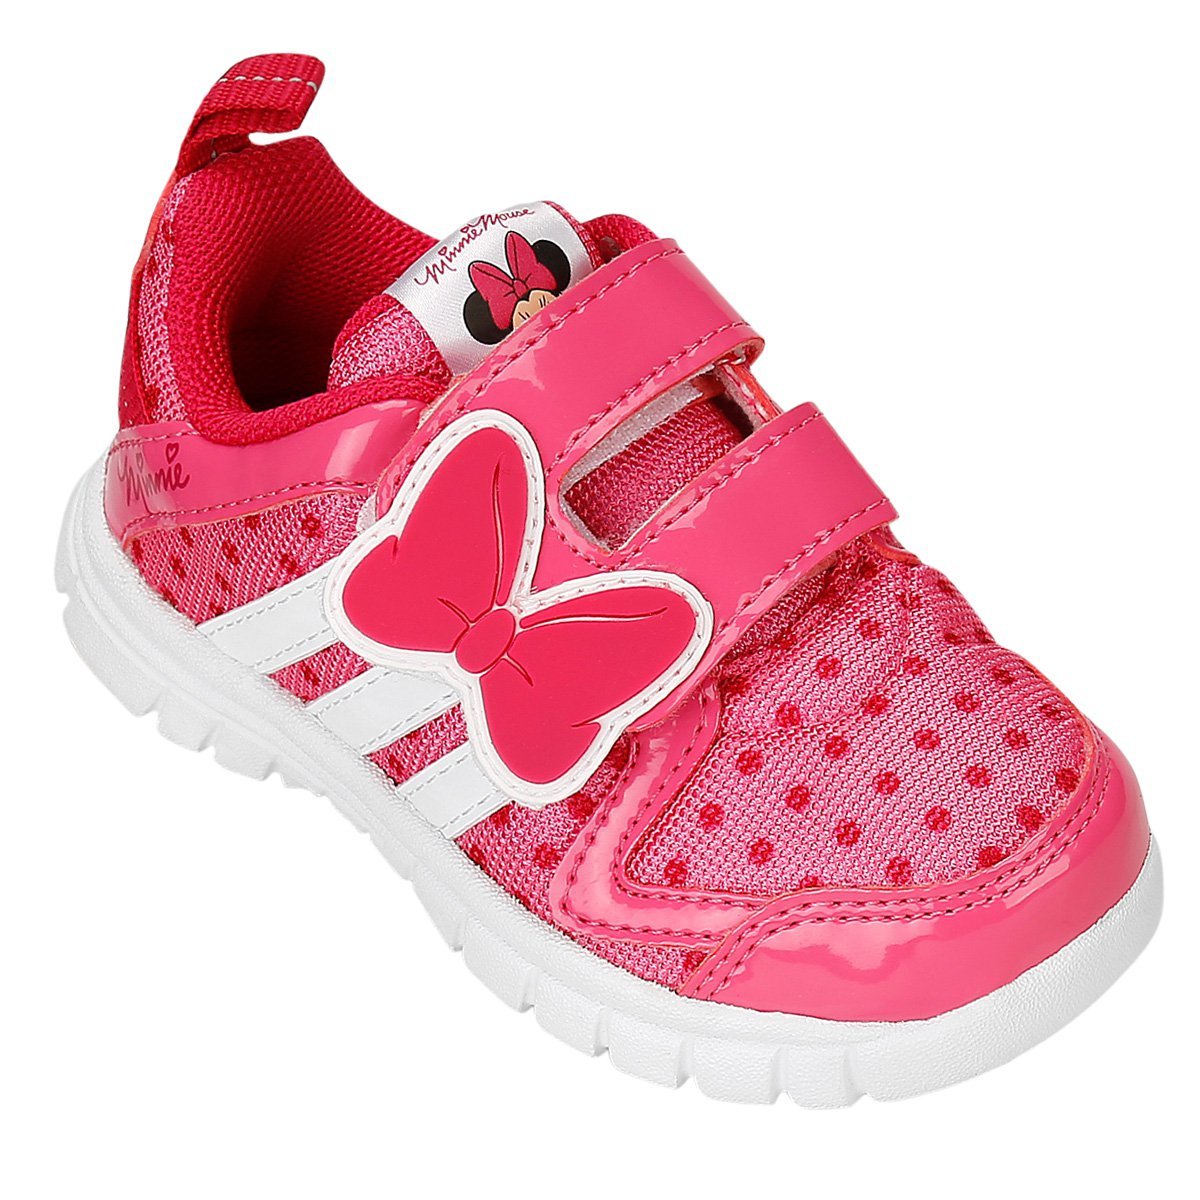 Tênis Adidas Disney Minnie CF Infantil - Compre Agora  893ad9db5c971